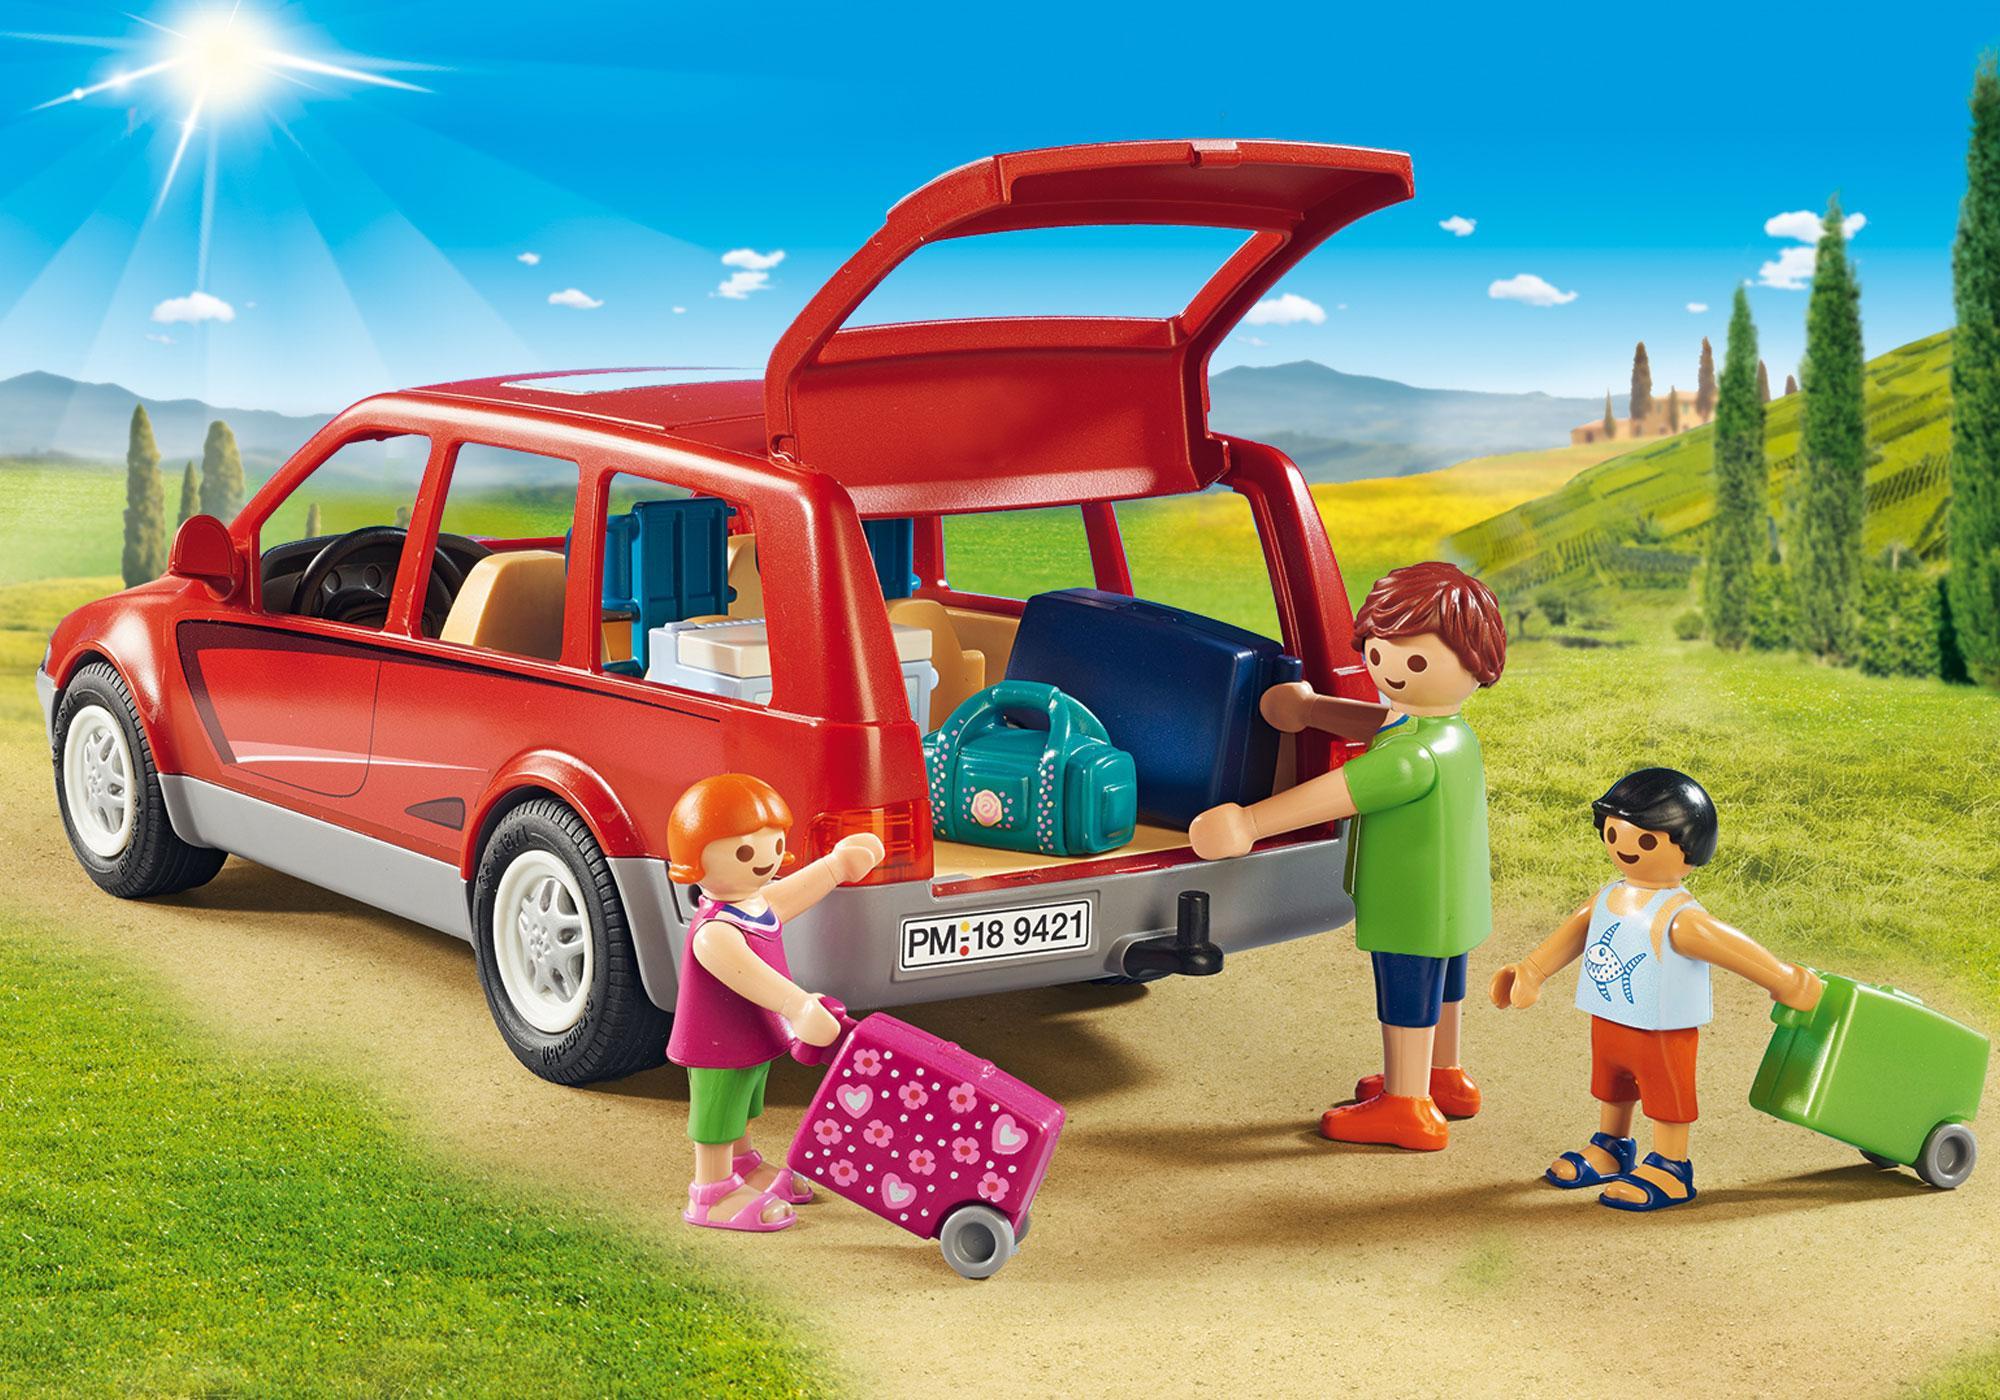 http://media.playmobil.com/i/playmobil/9421_product_extra1/Samochód rodzinny